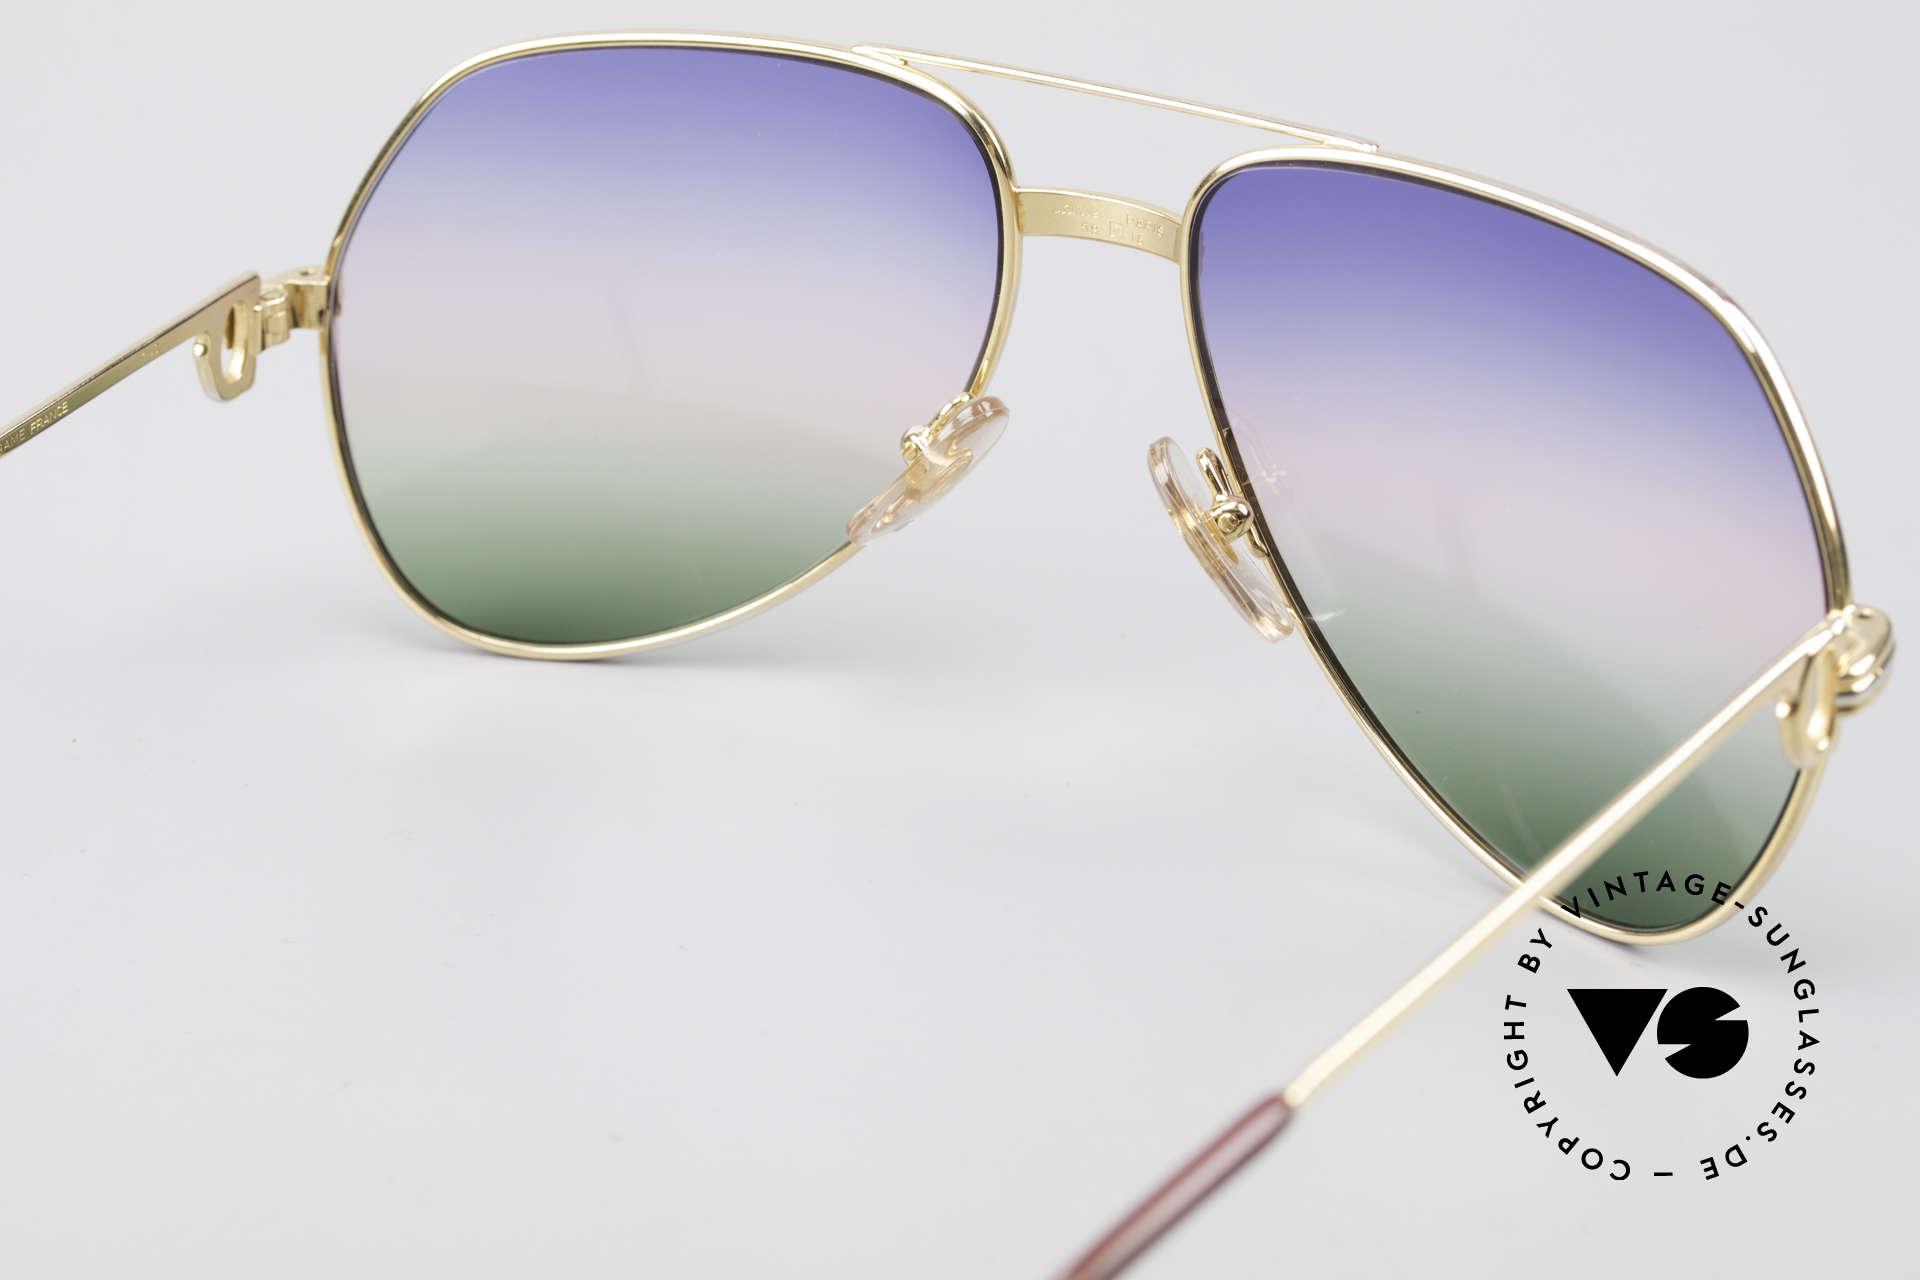 Cartier Vendome LC - M Michael Douglas Sonnenbrille, 2nd hand Modell im neuwertigen Zustand + Cartier Box, Passend für Herren